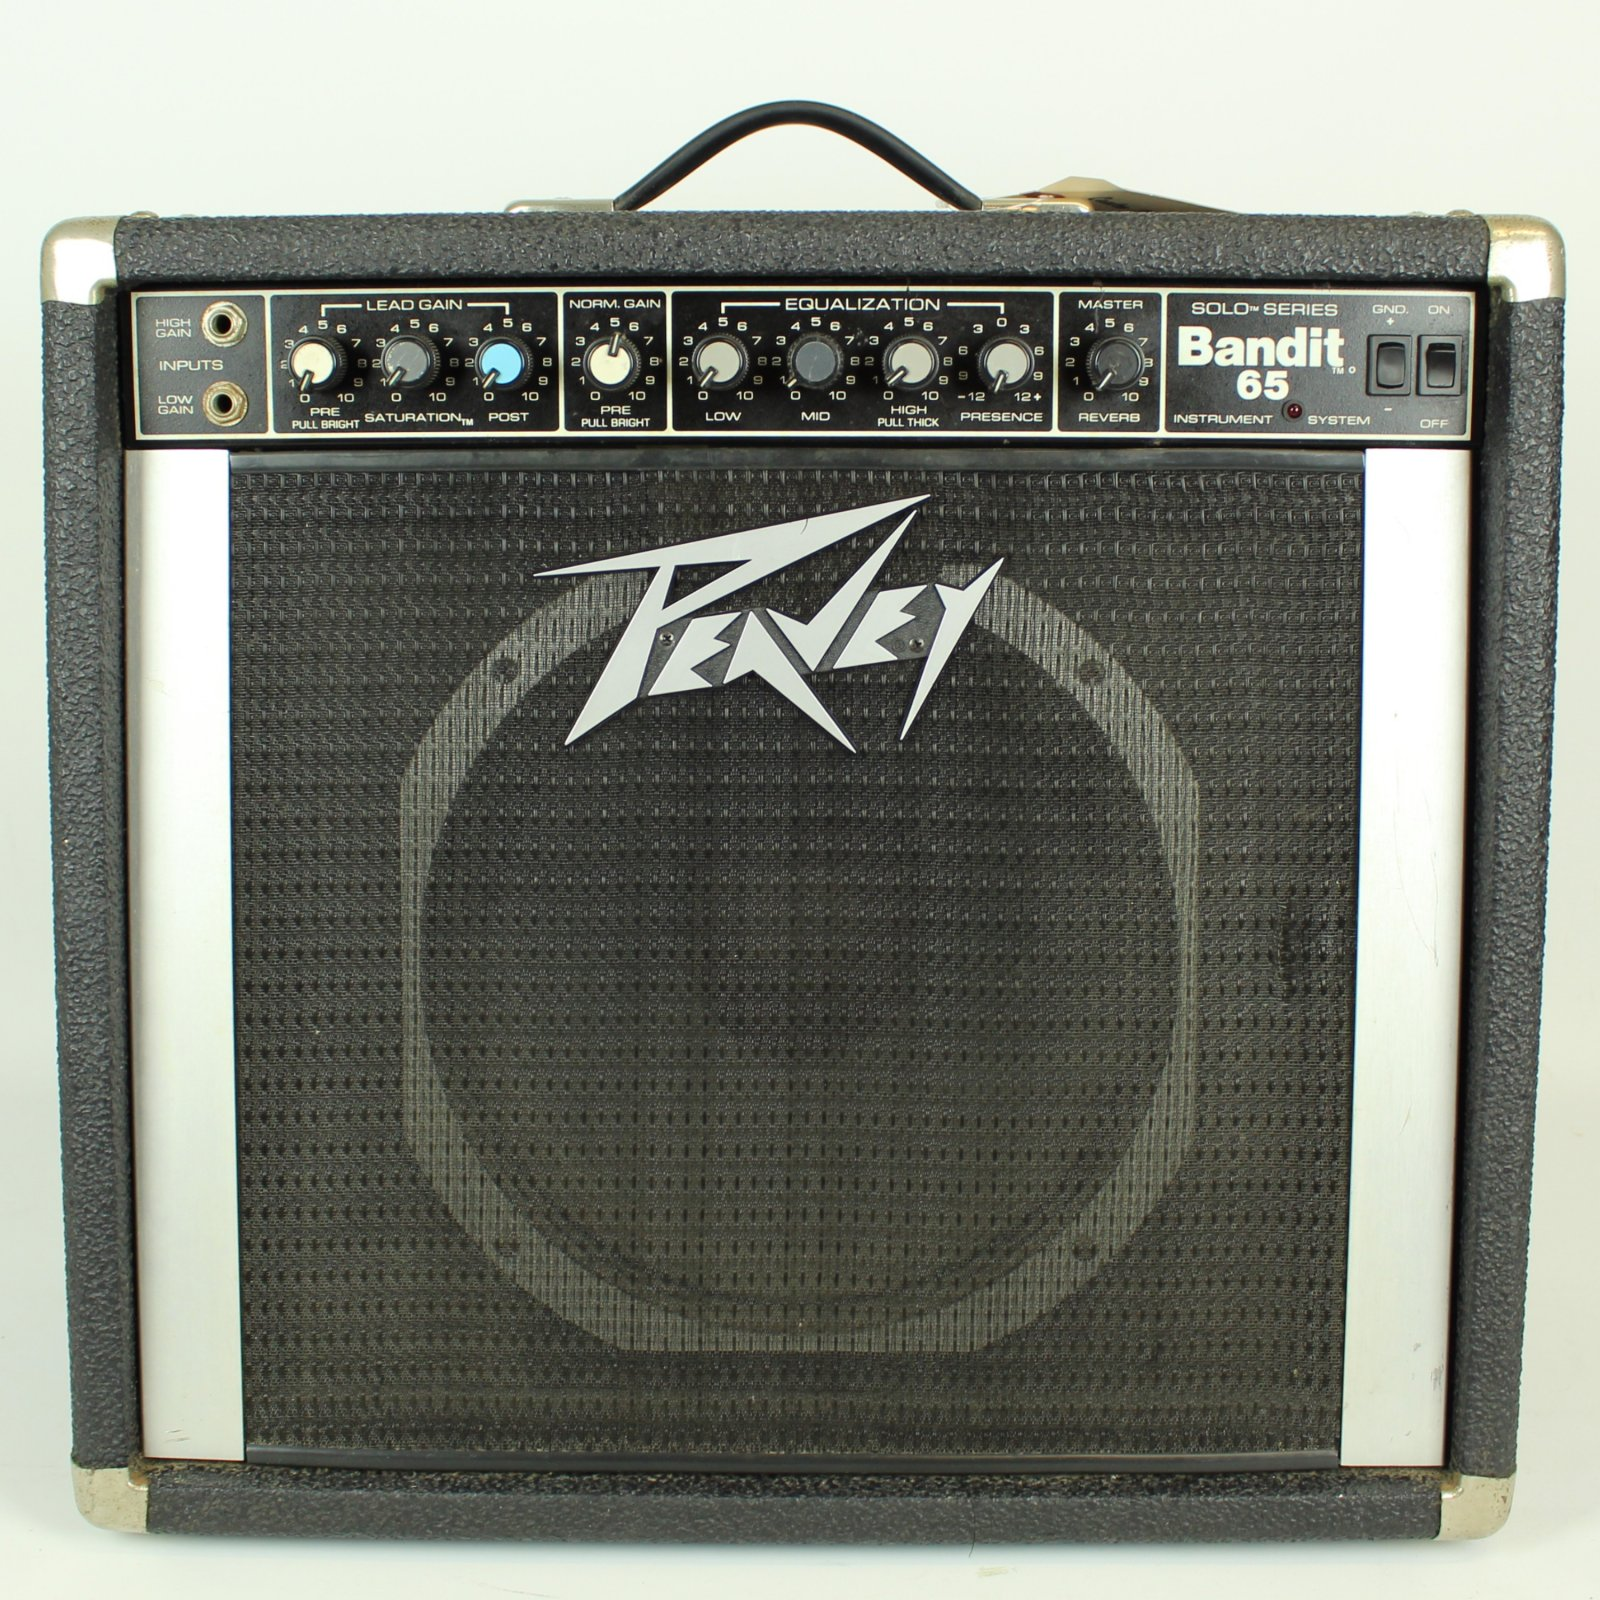 Peavey Bandit 65 Solo Series 65-Watt 1x12 Guitar Combo Amp w/ Footswitch (USED)